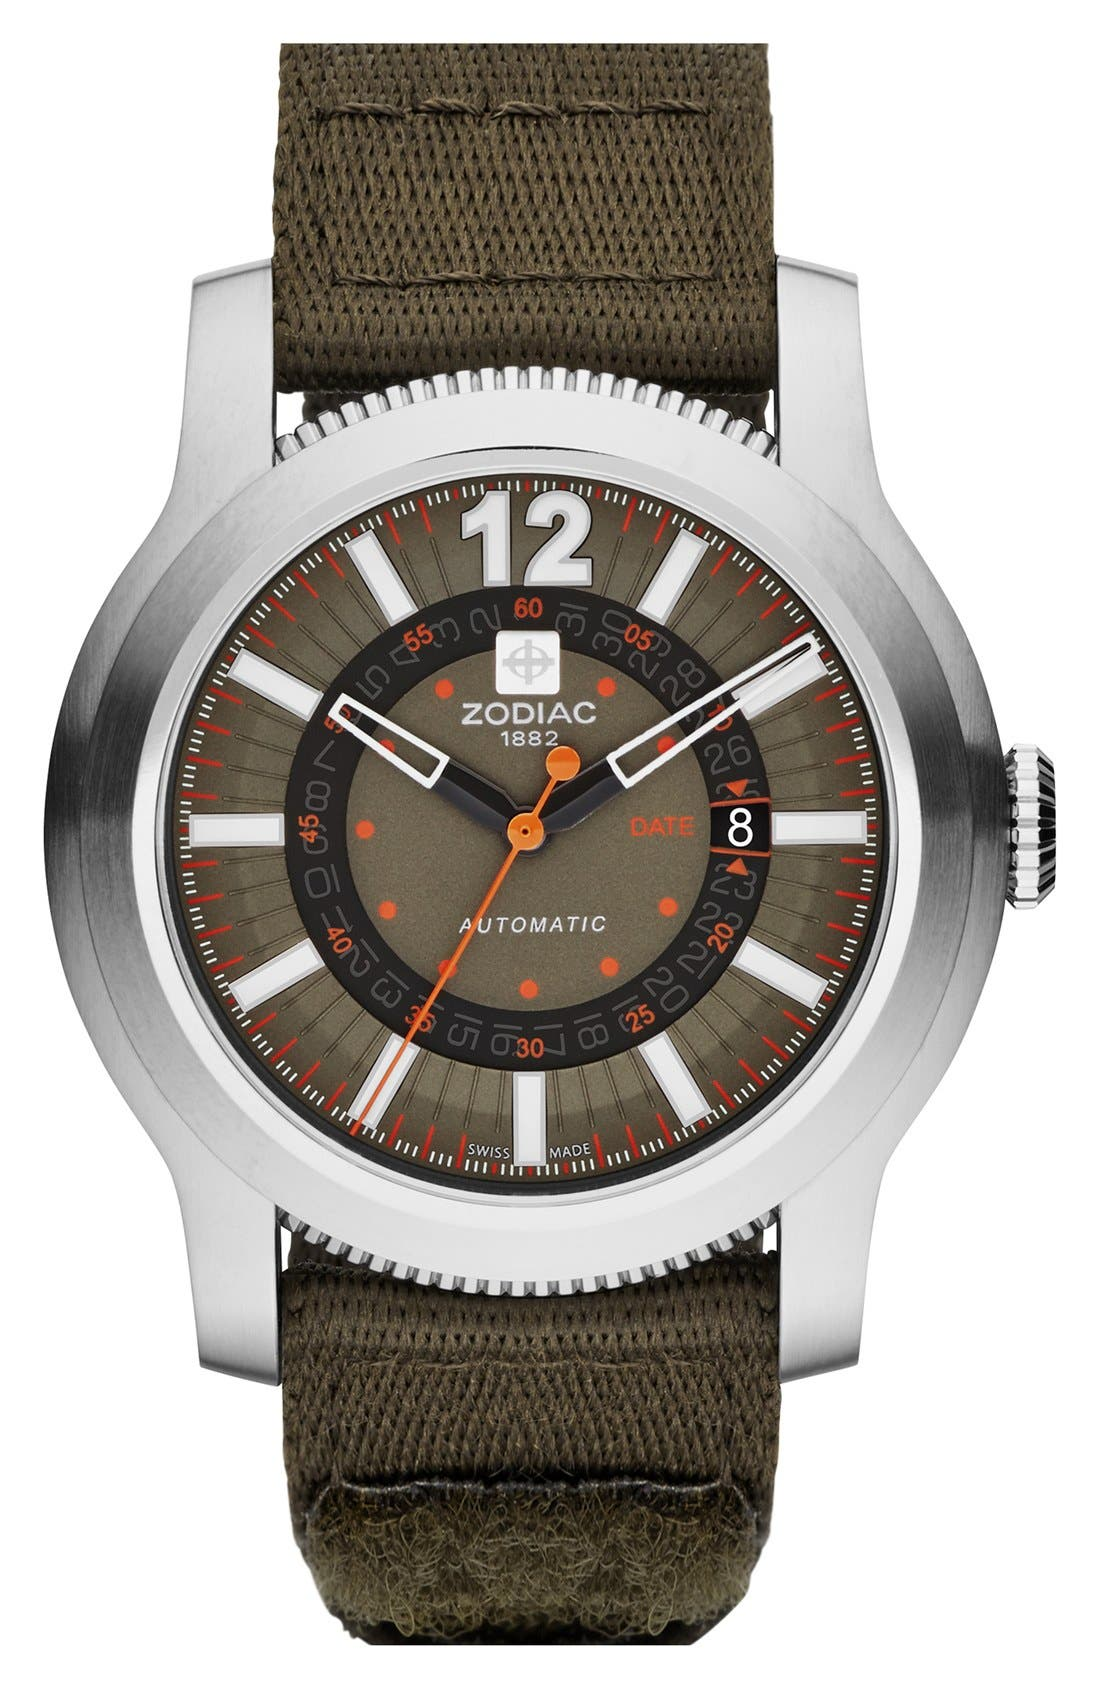 Alternate Image 1 Selected - Zodiac 'Jet-O-Matic' Automatic Watch, 46mm